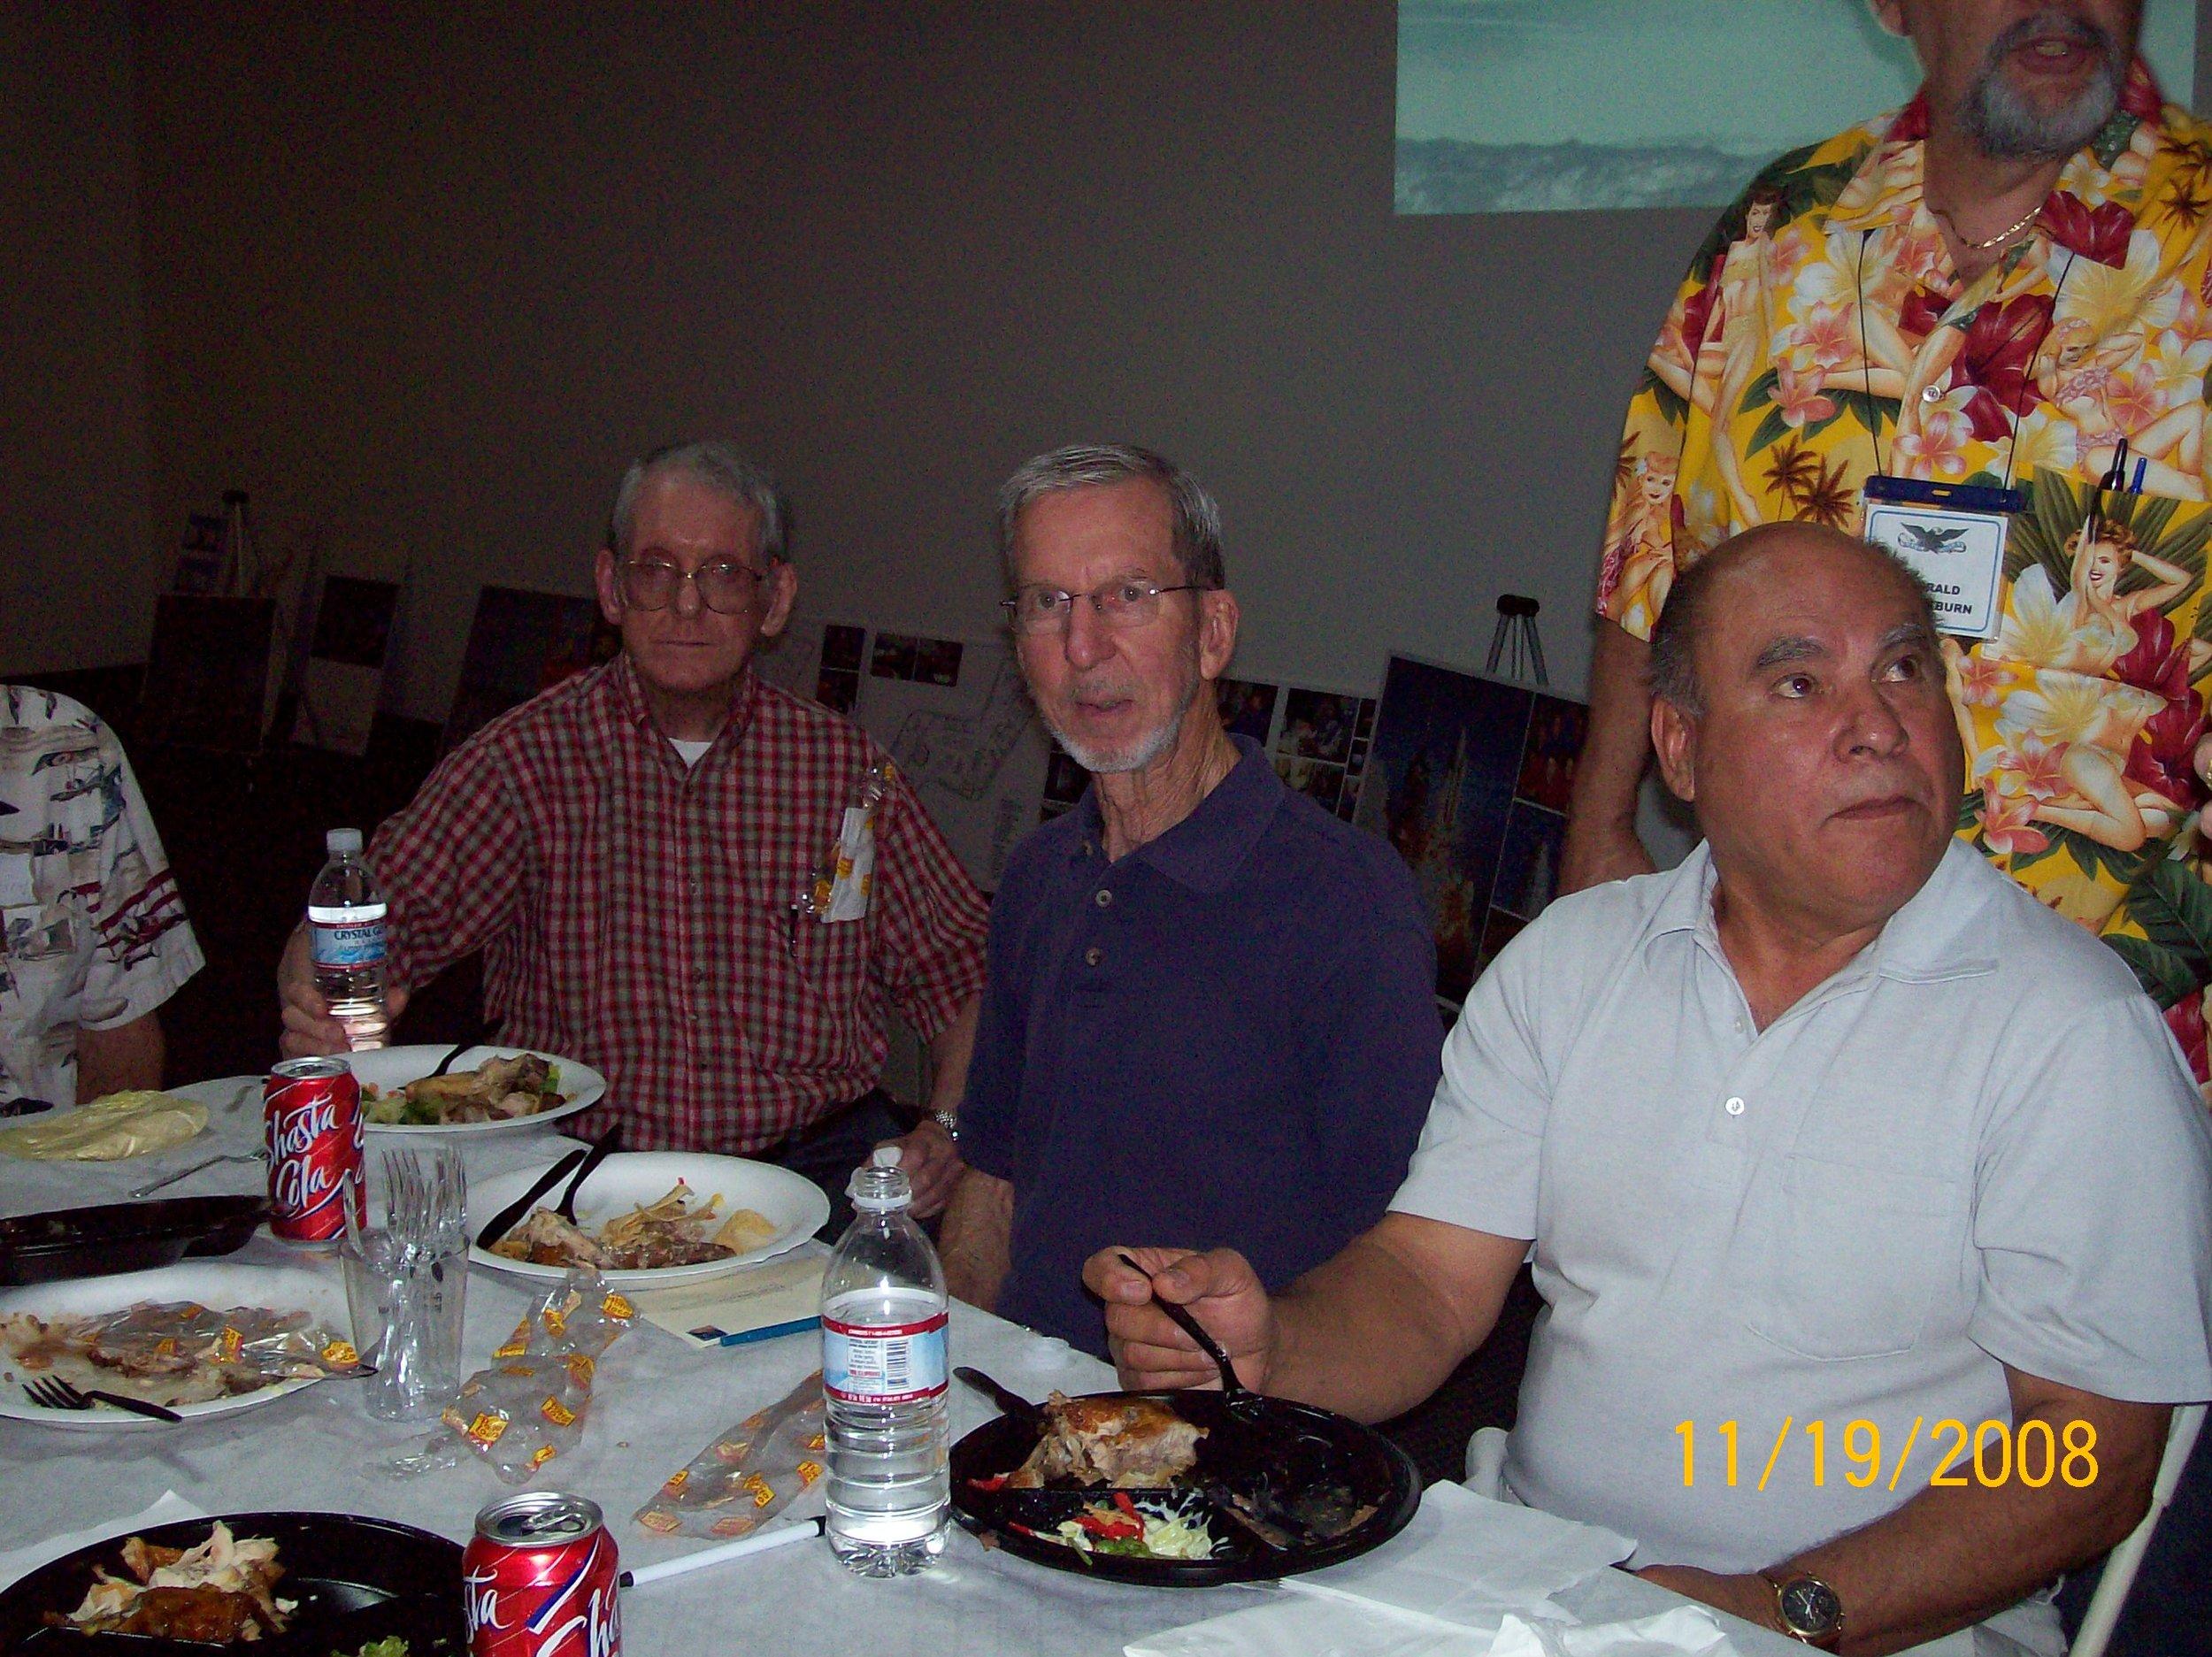 alf luncheon 11 19 2008 048.jpg